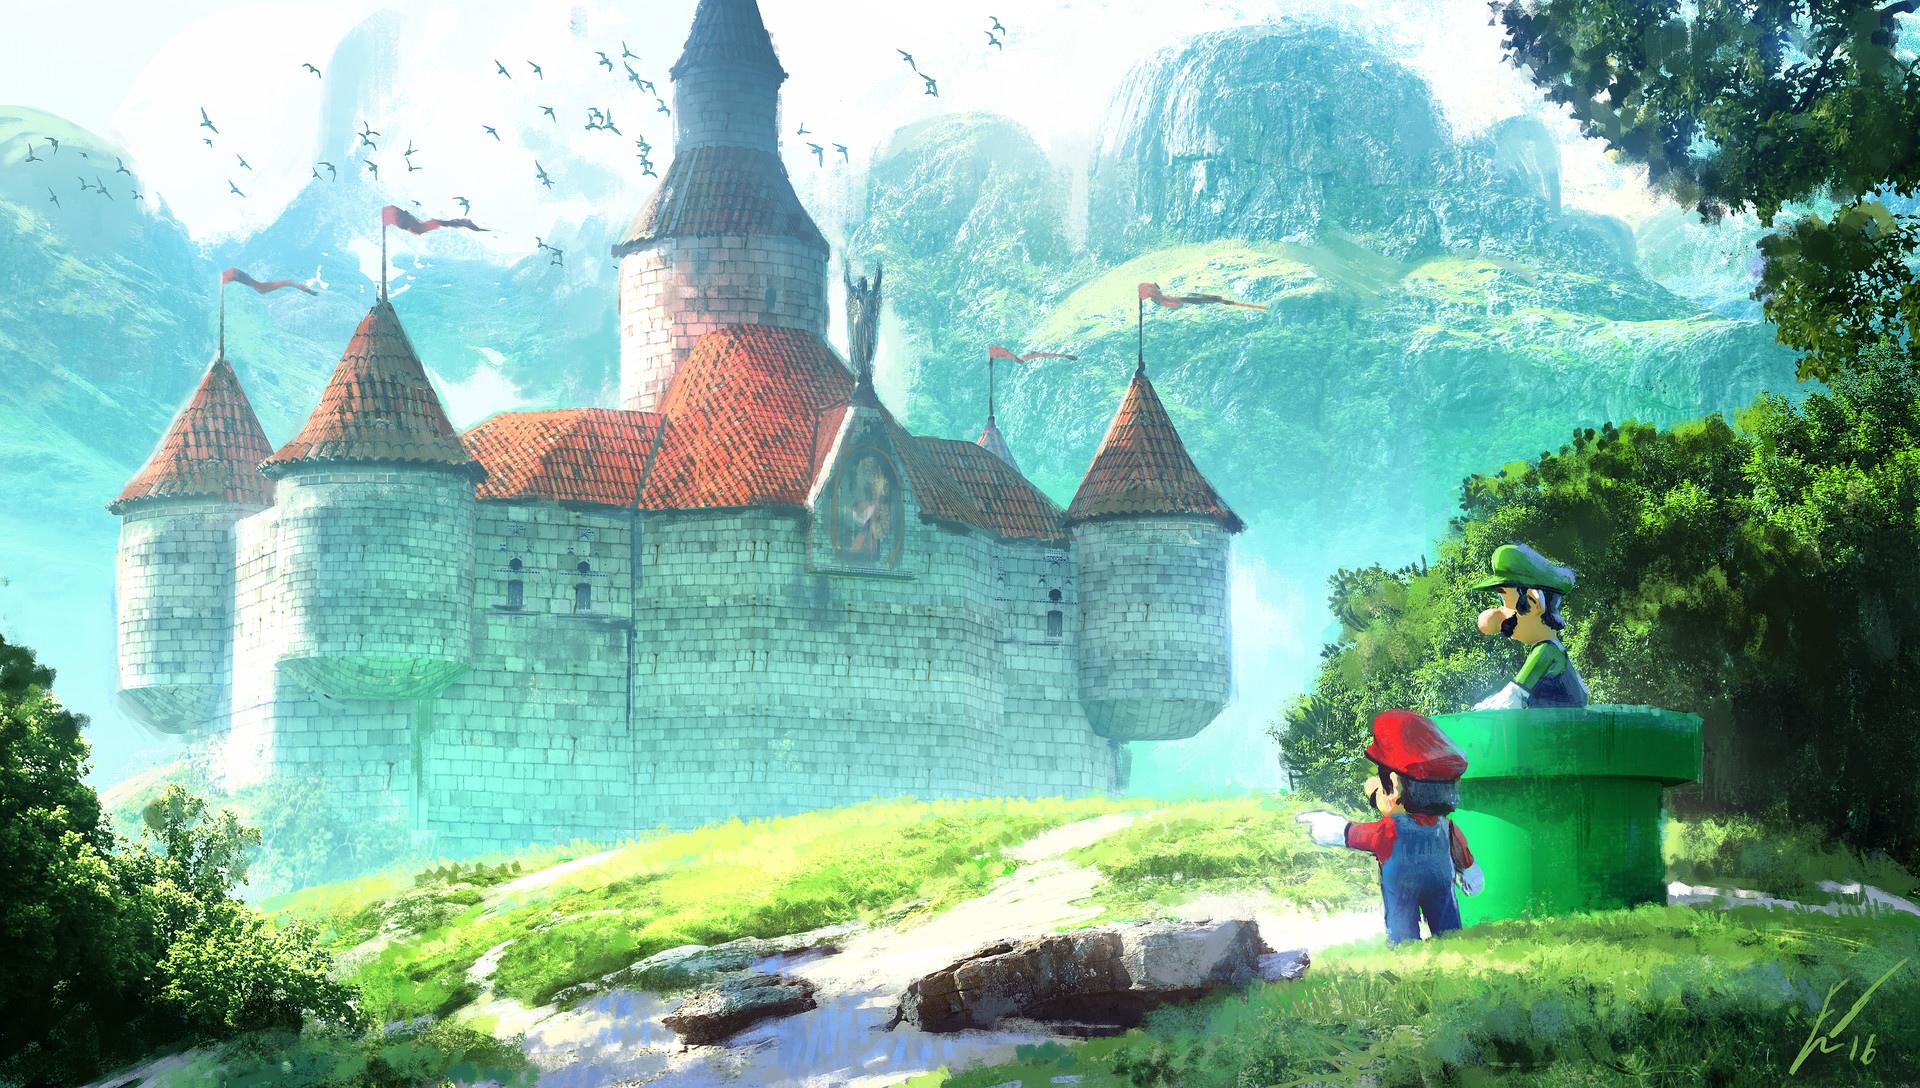 Imagenes Fondos De Pantalla: Fondos De Pantalla De Super Mario, Wallpapers